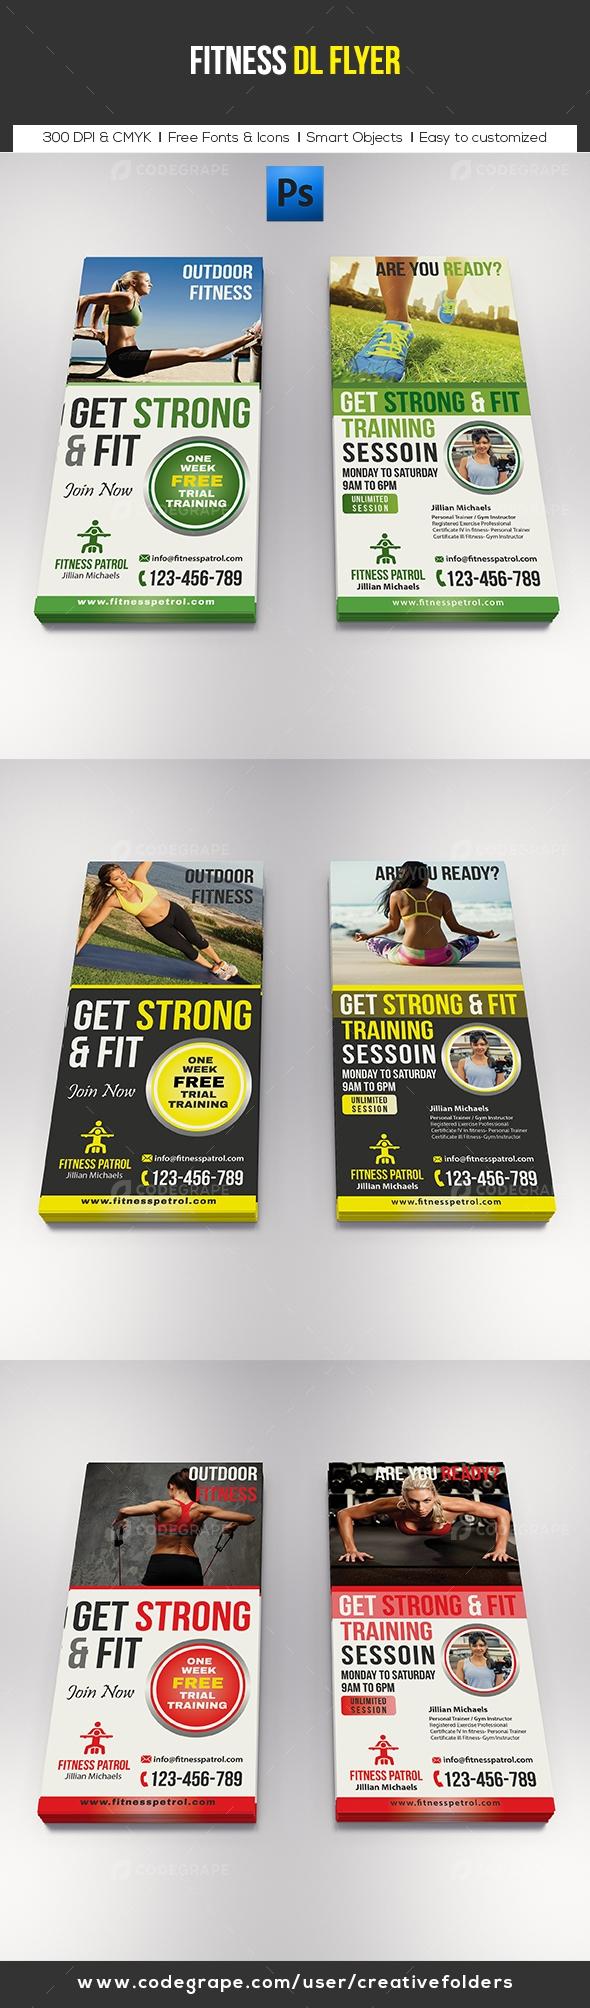 Fitness DL Flyer